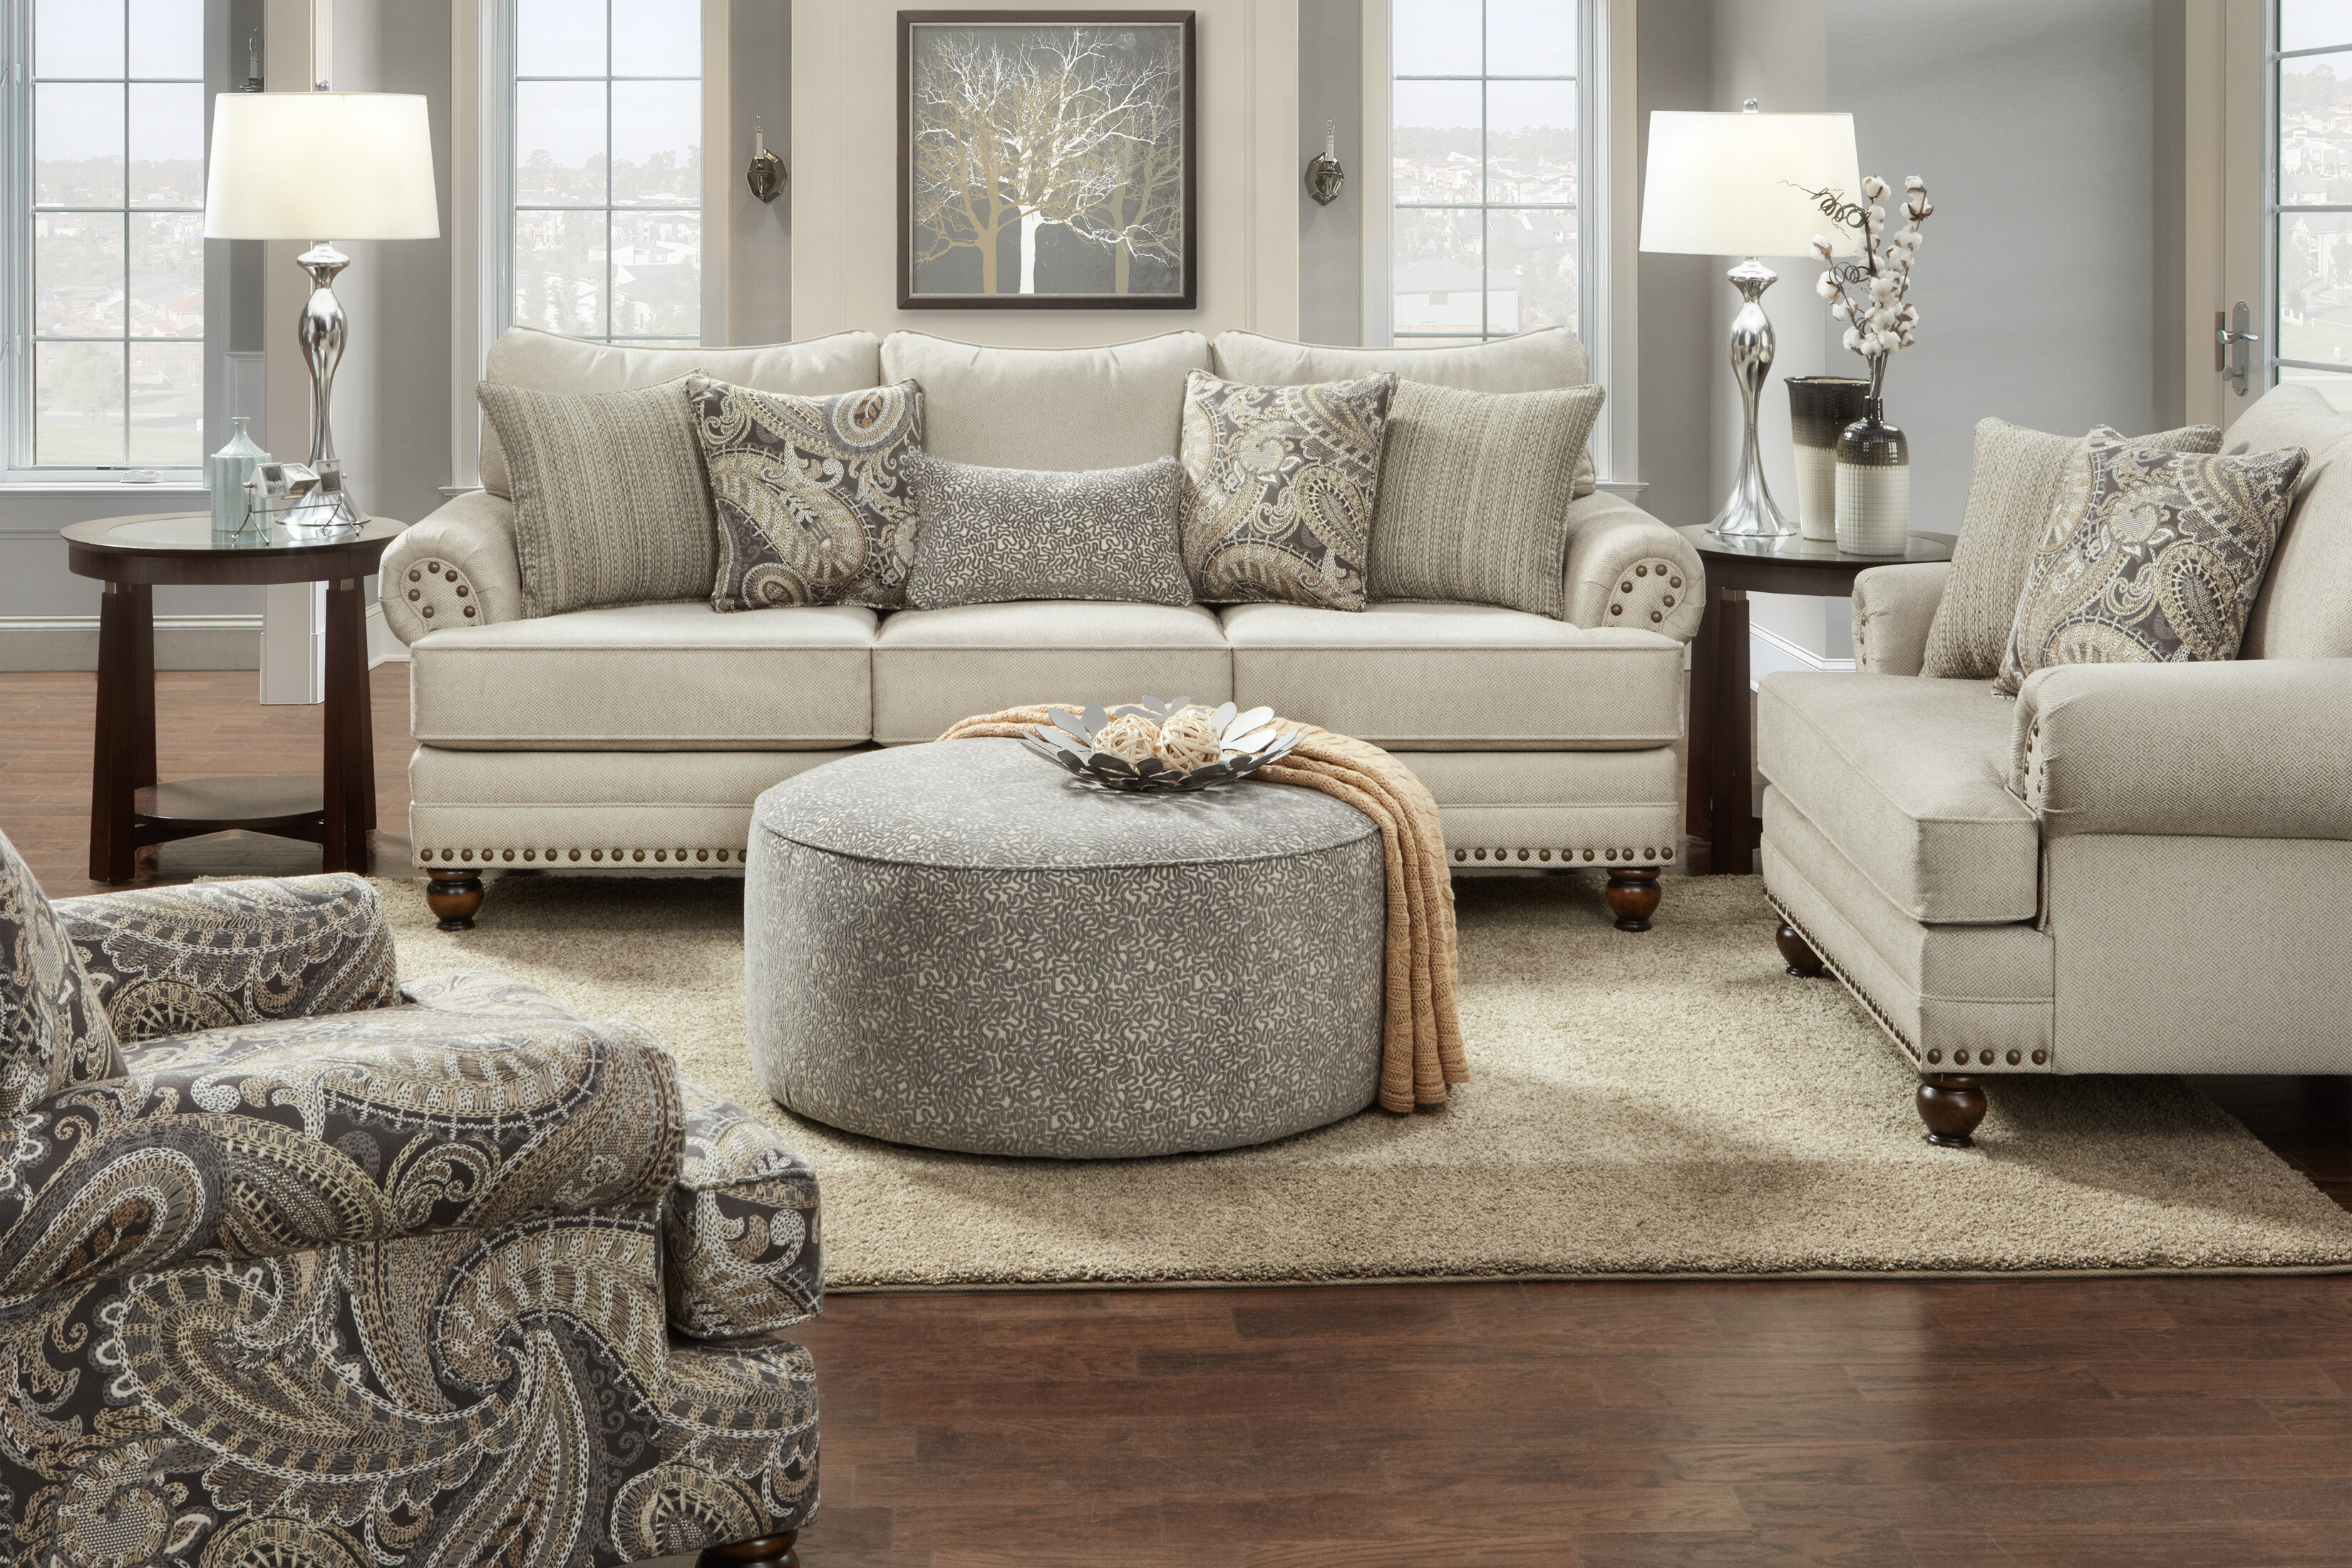 Canora Grey Brockway 4 Piece Living Room Set & Reviews | Wayfair